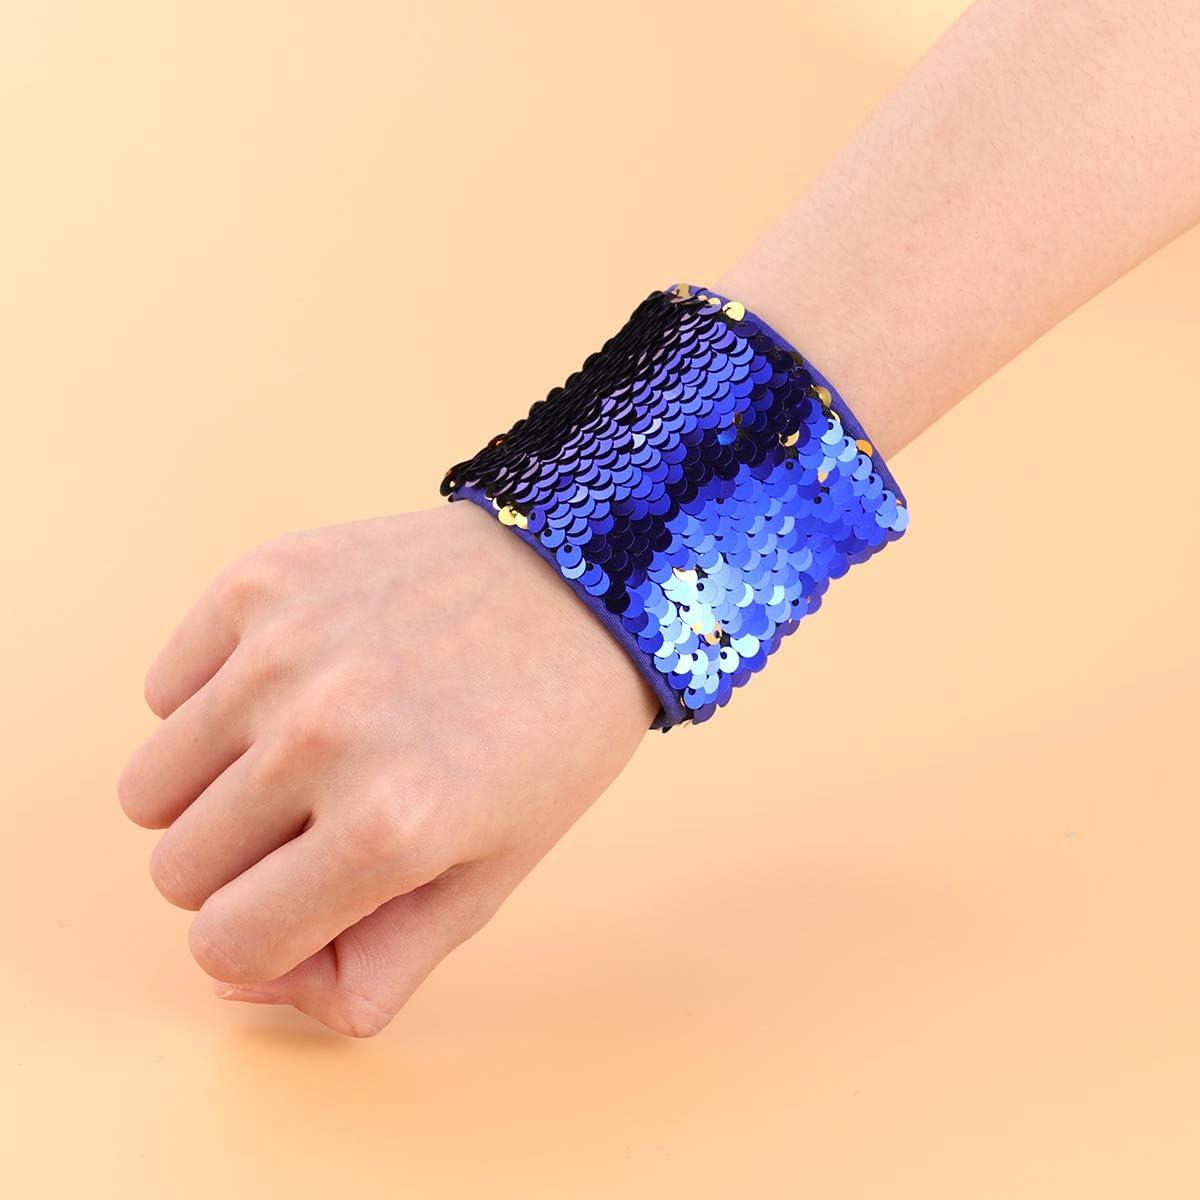 Mermaid Bracelet Tinksky Reversible Charm Sequins Slap Wristband Bracelet Magic Calming Bracelets for Birthday Party Favors Royal Blue and Golden